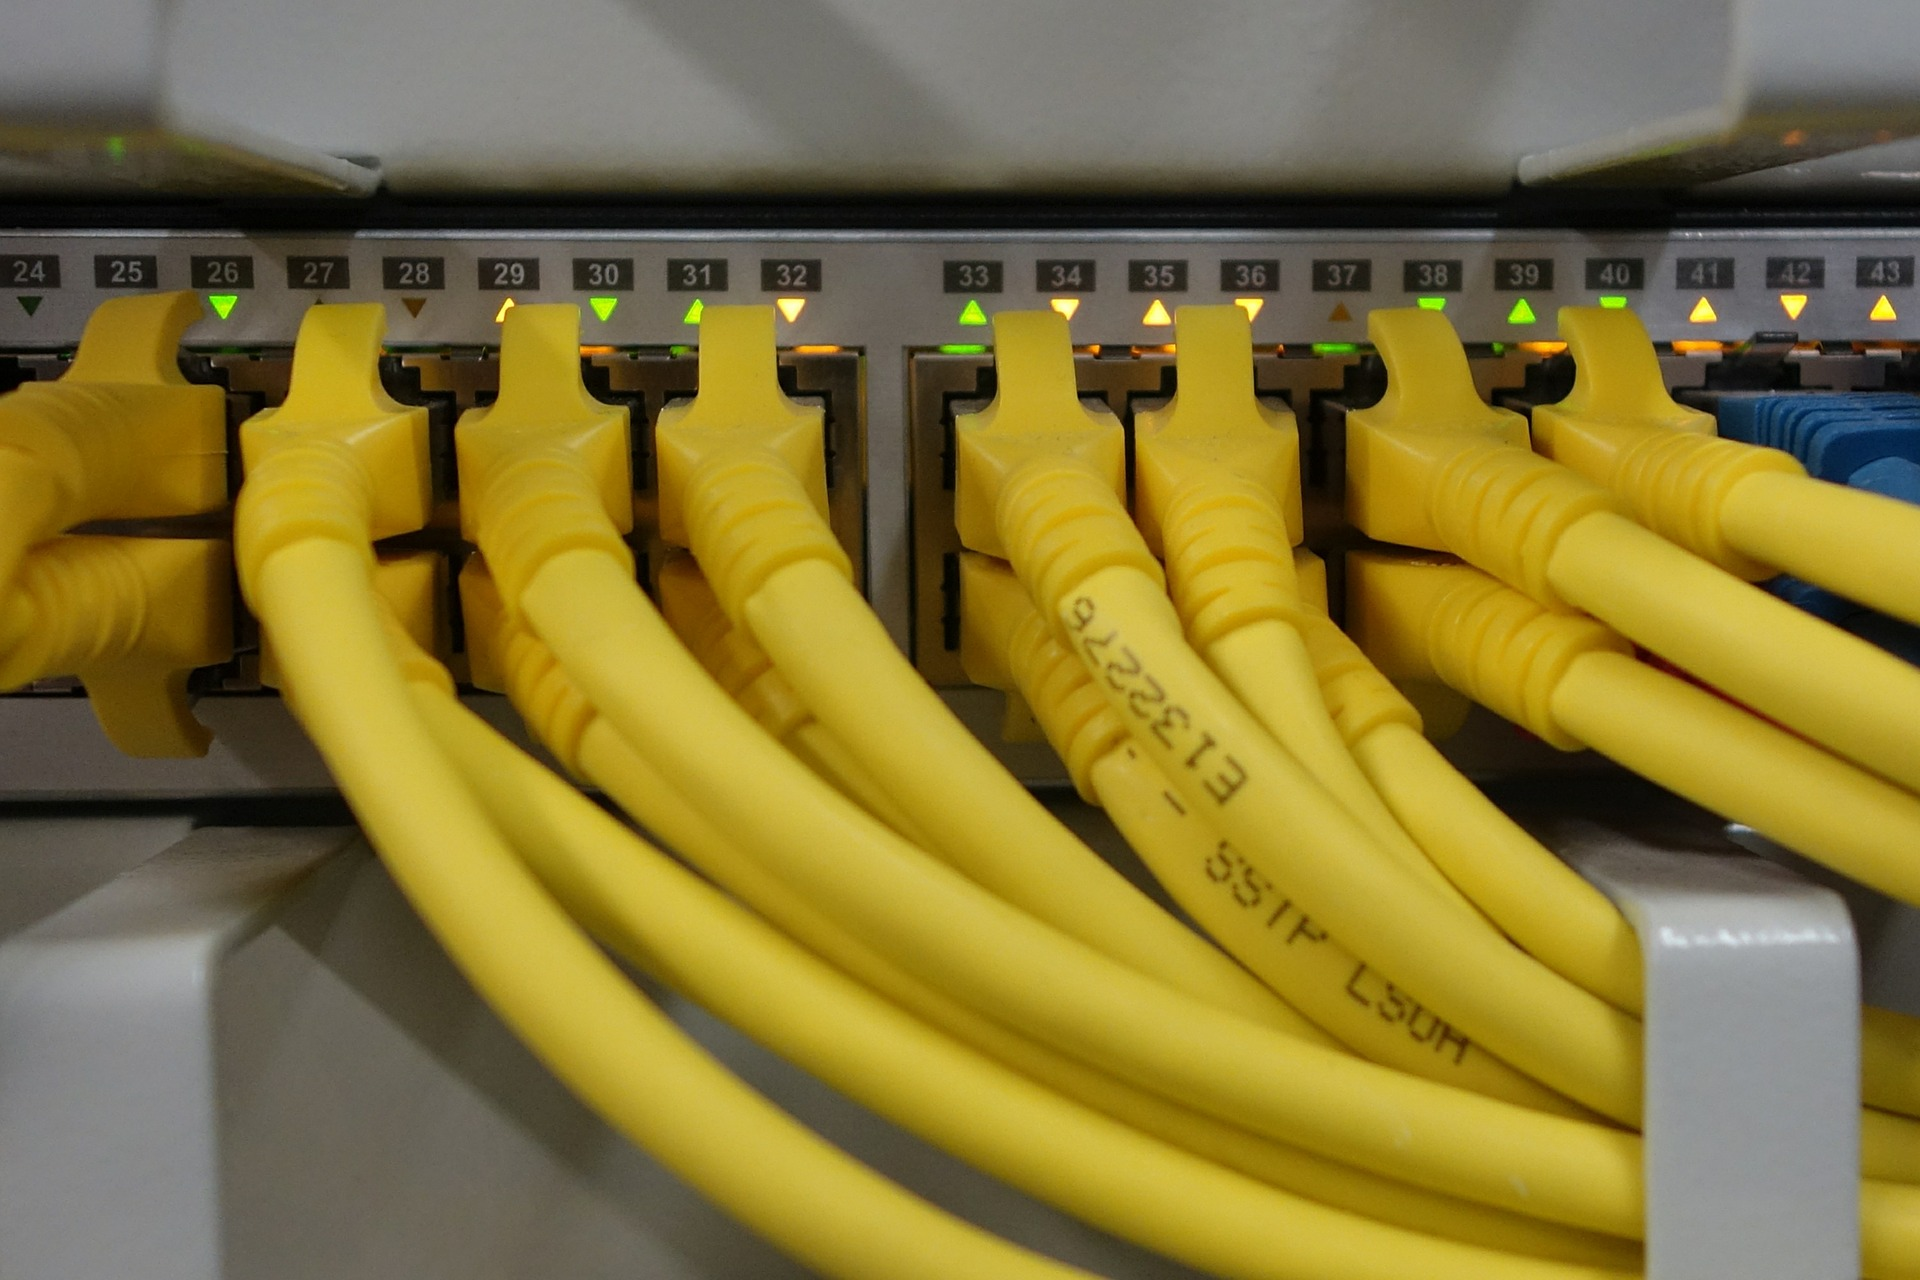 Harahan Louisiana Premier Voice & Data Network Cabling Services